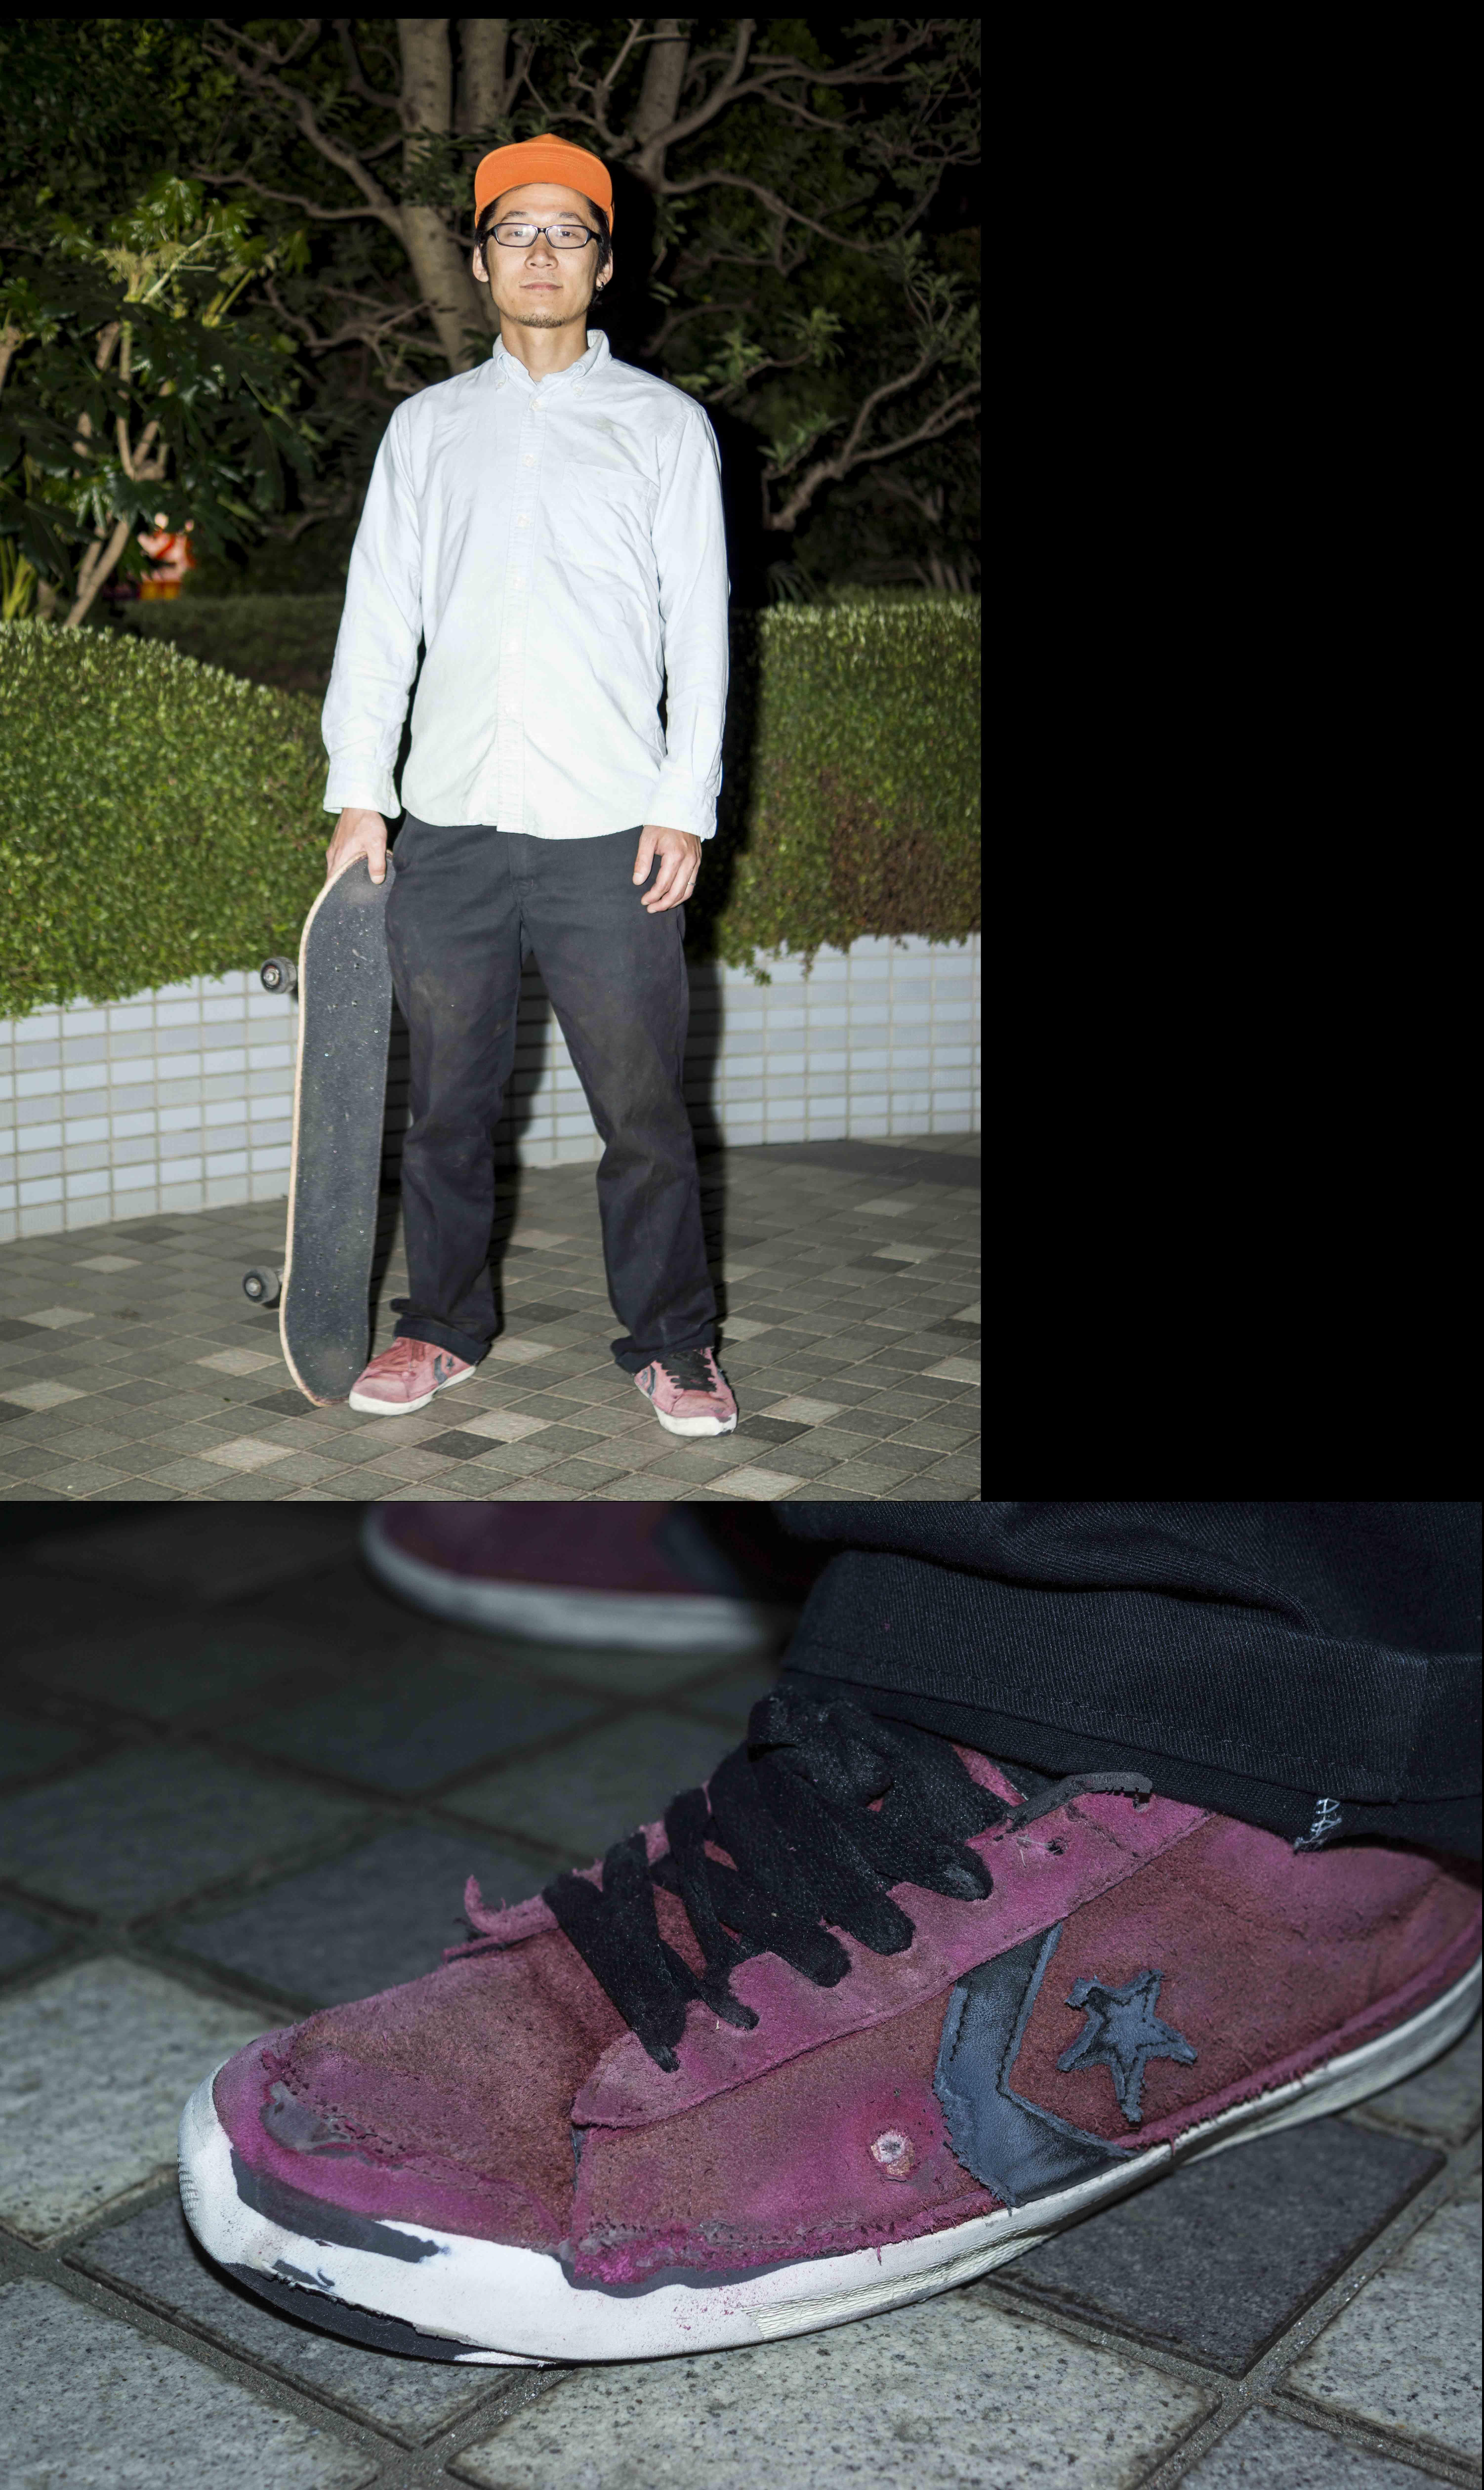 Symbol of skateboard 内藤 自伸